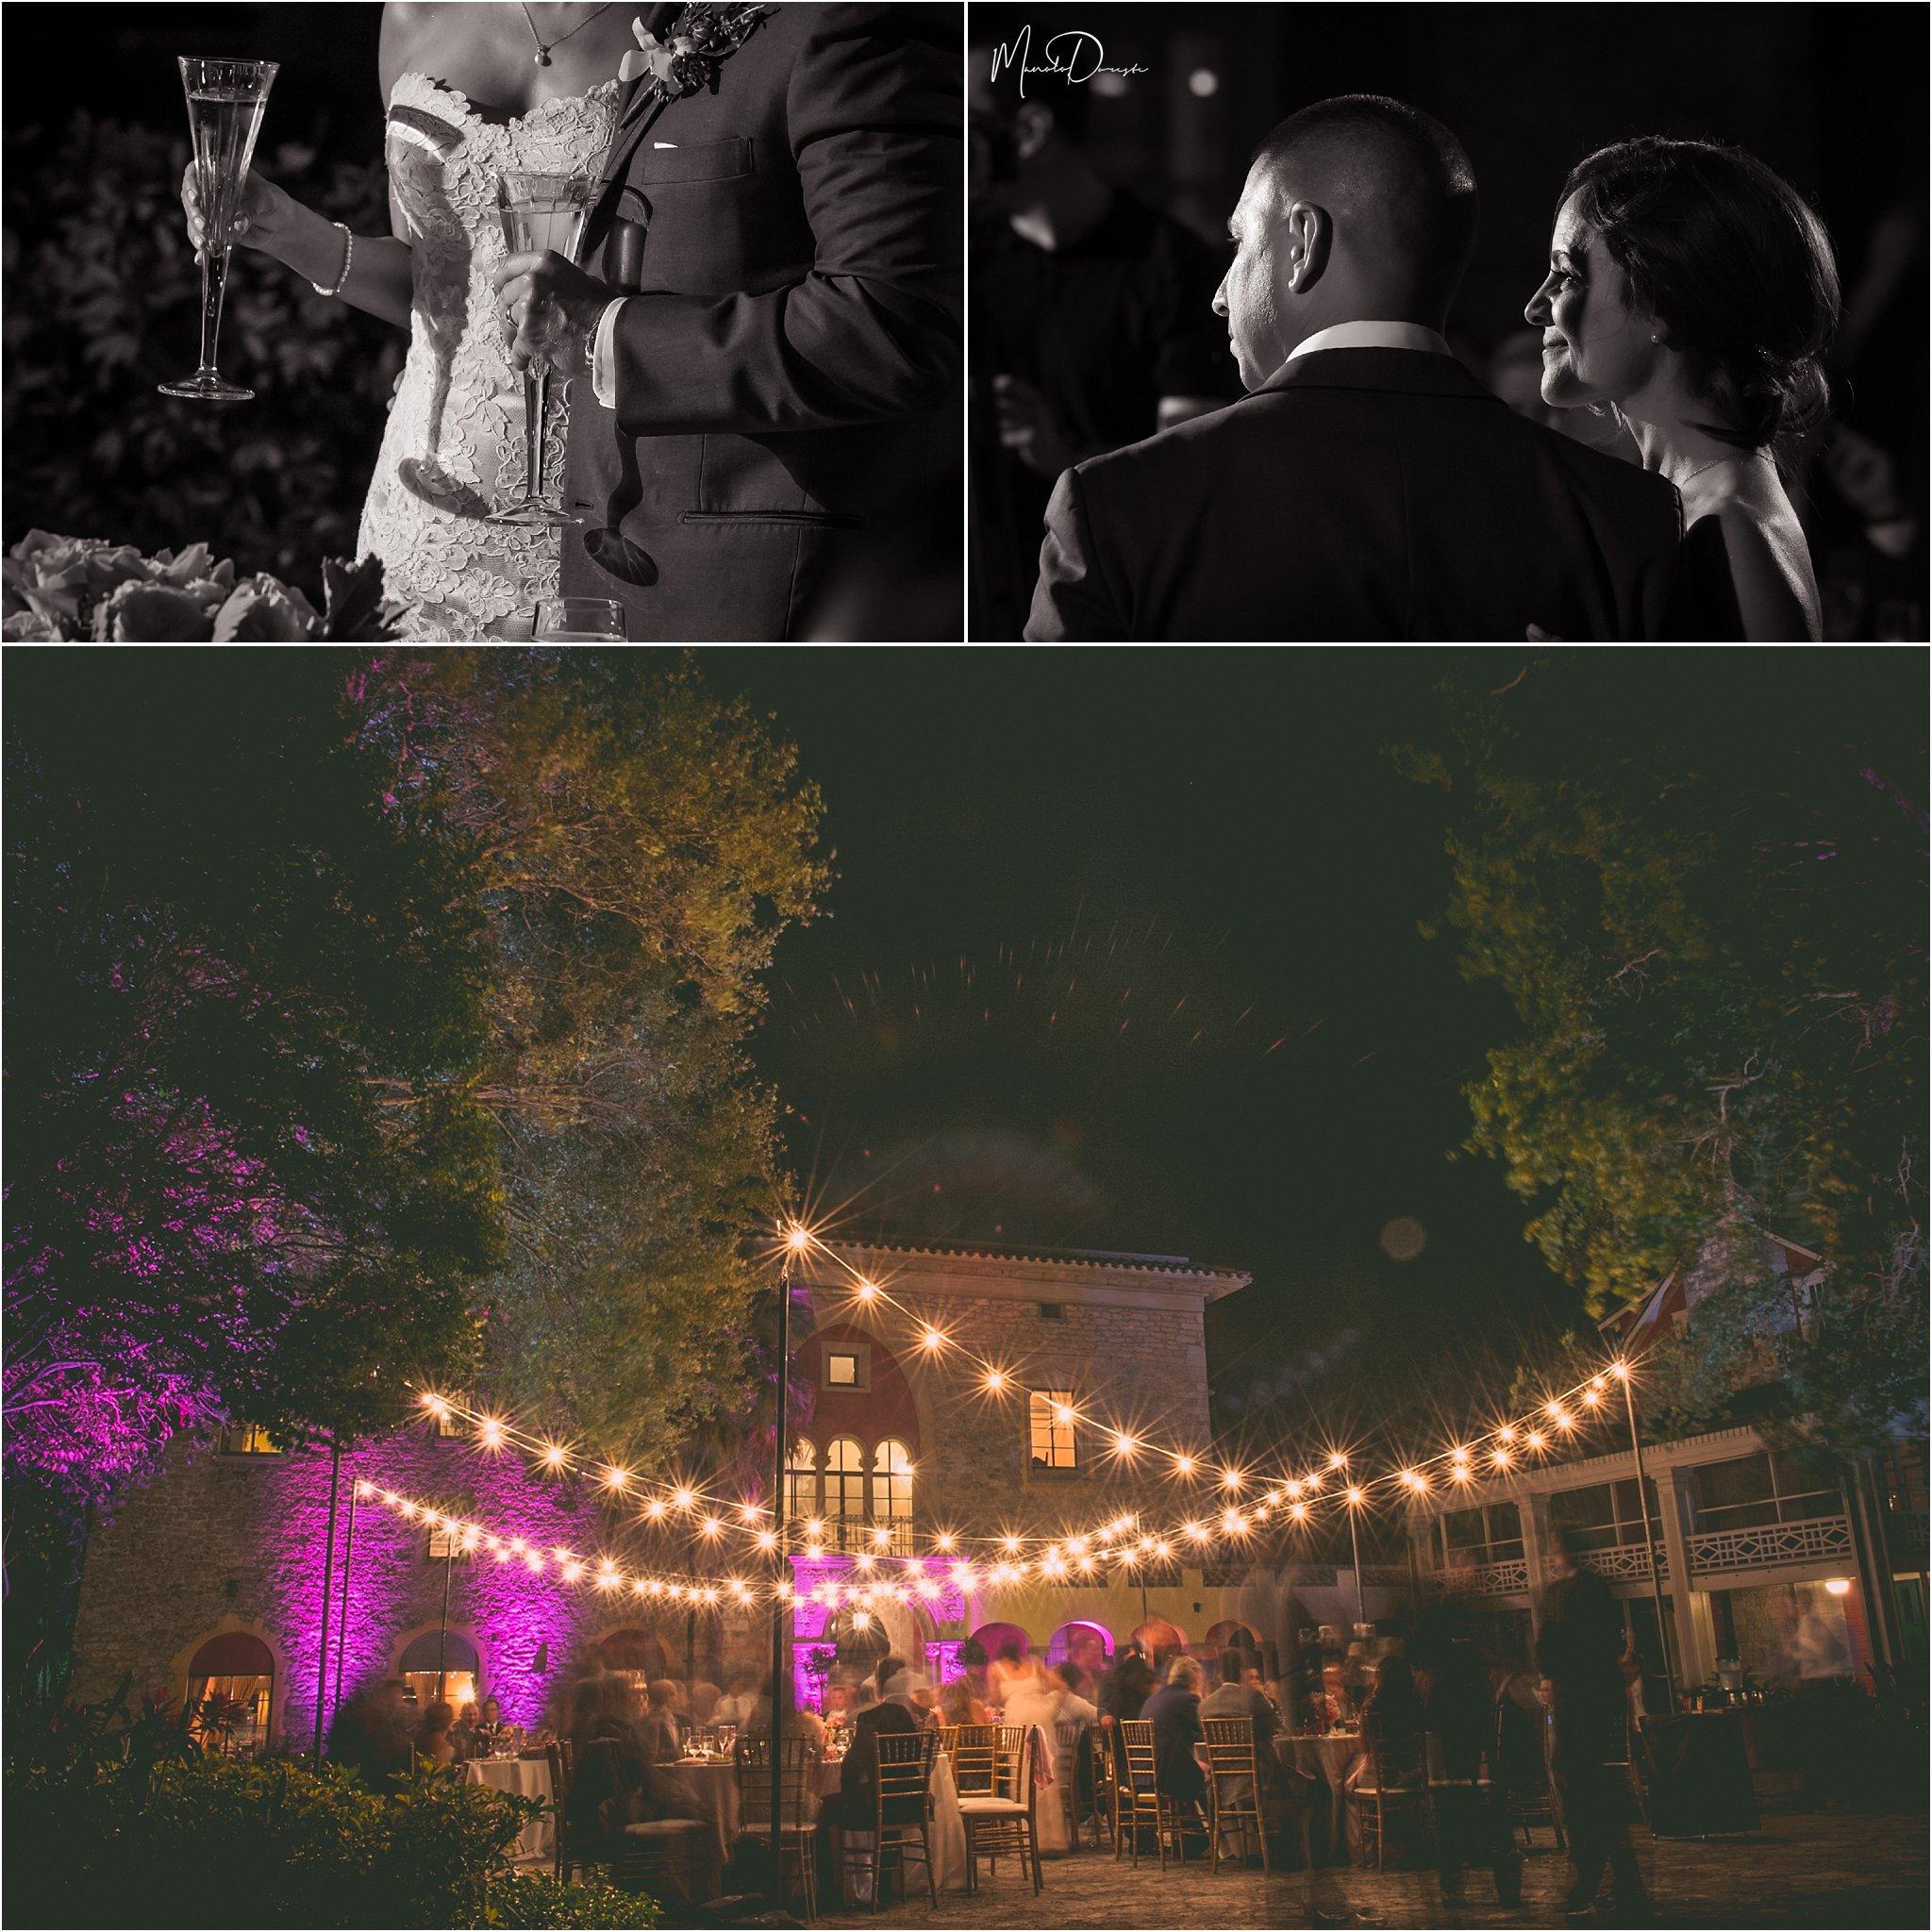 00849_ManoloDoreste_InFocusStudios_Wedding_Family_Photography_Miami_MiamiPhotographer.jpg